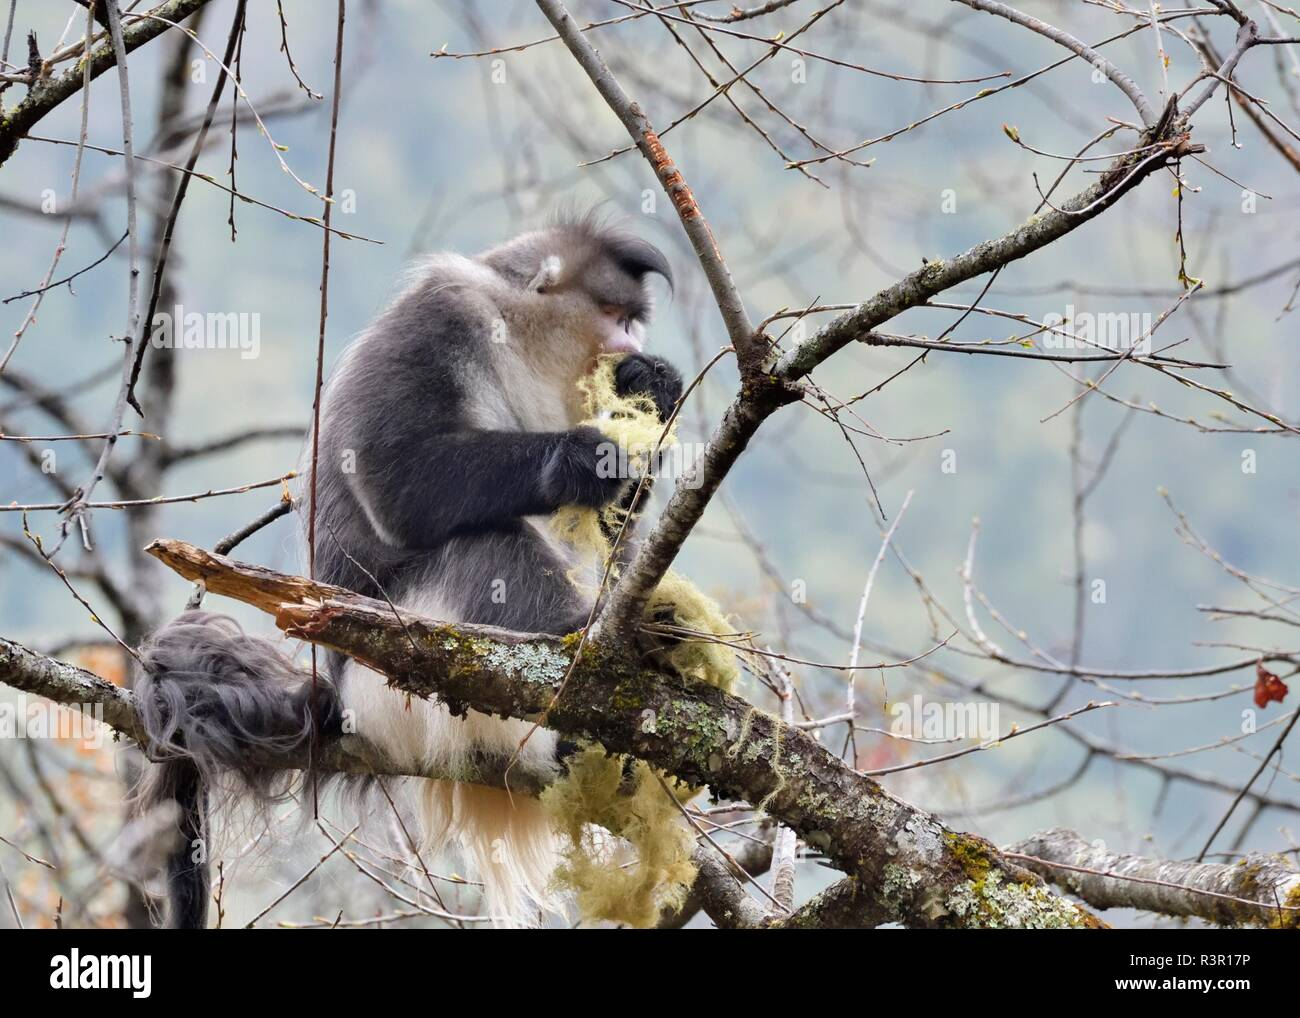 Black Snub-nosed Monkey (Rhinopithecus bieti) eating on a branch, Yunnan, China - Stock Image